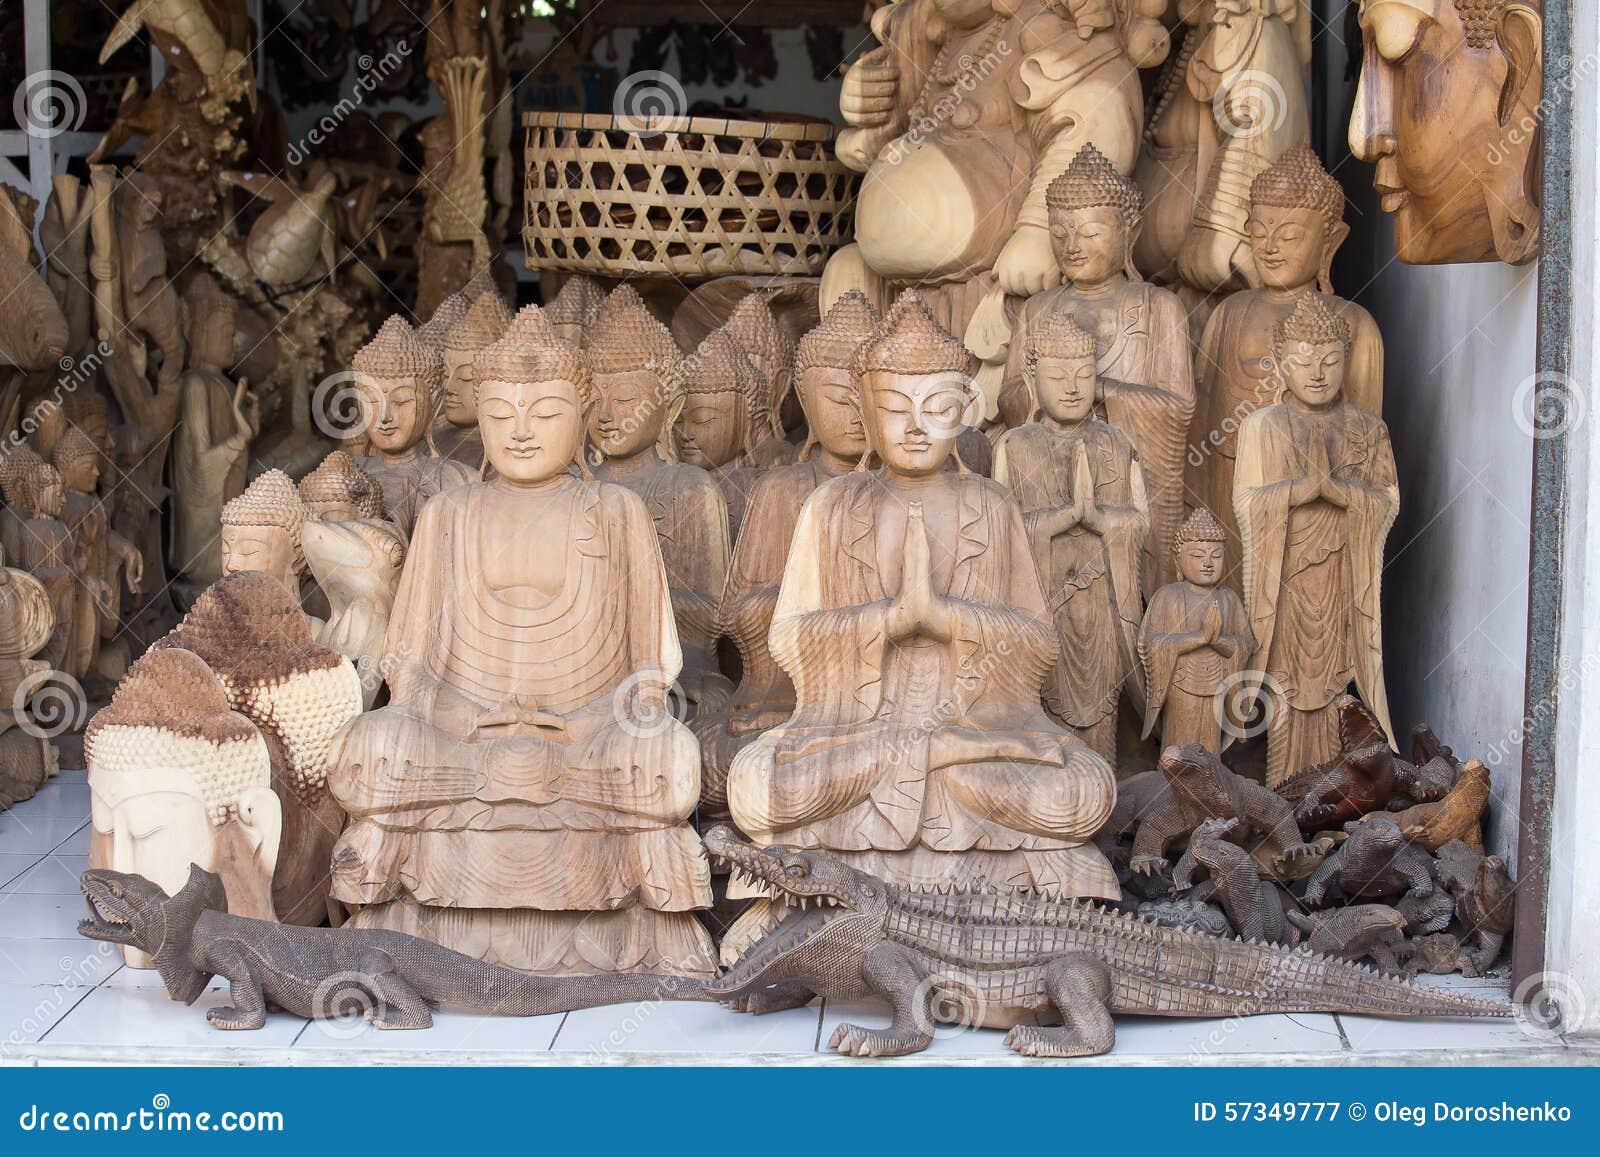 The wooden decoration in bali style editorial image - Artesania de indonesia ...